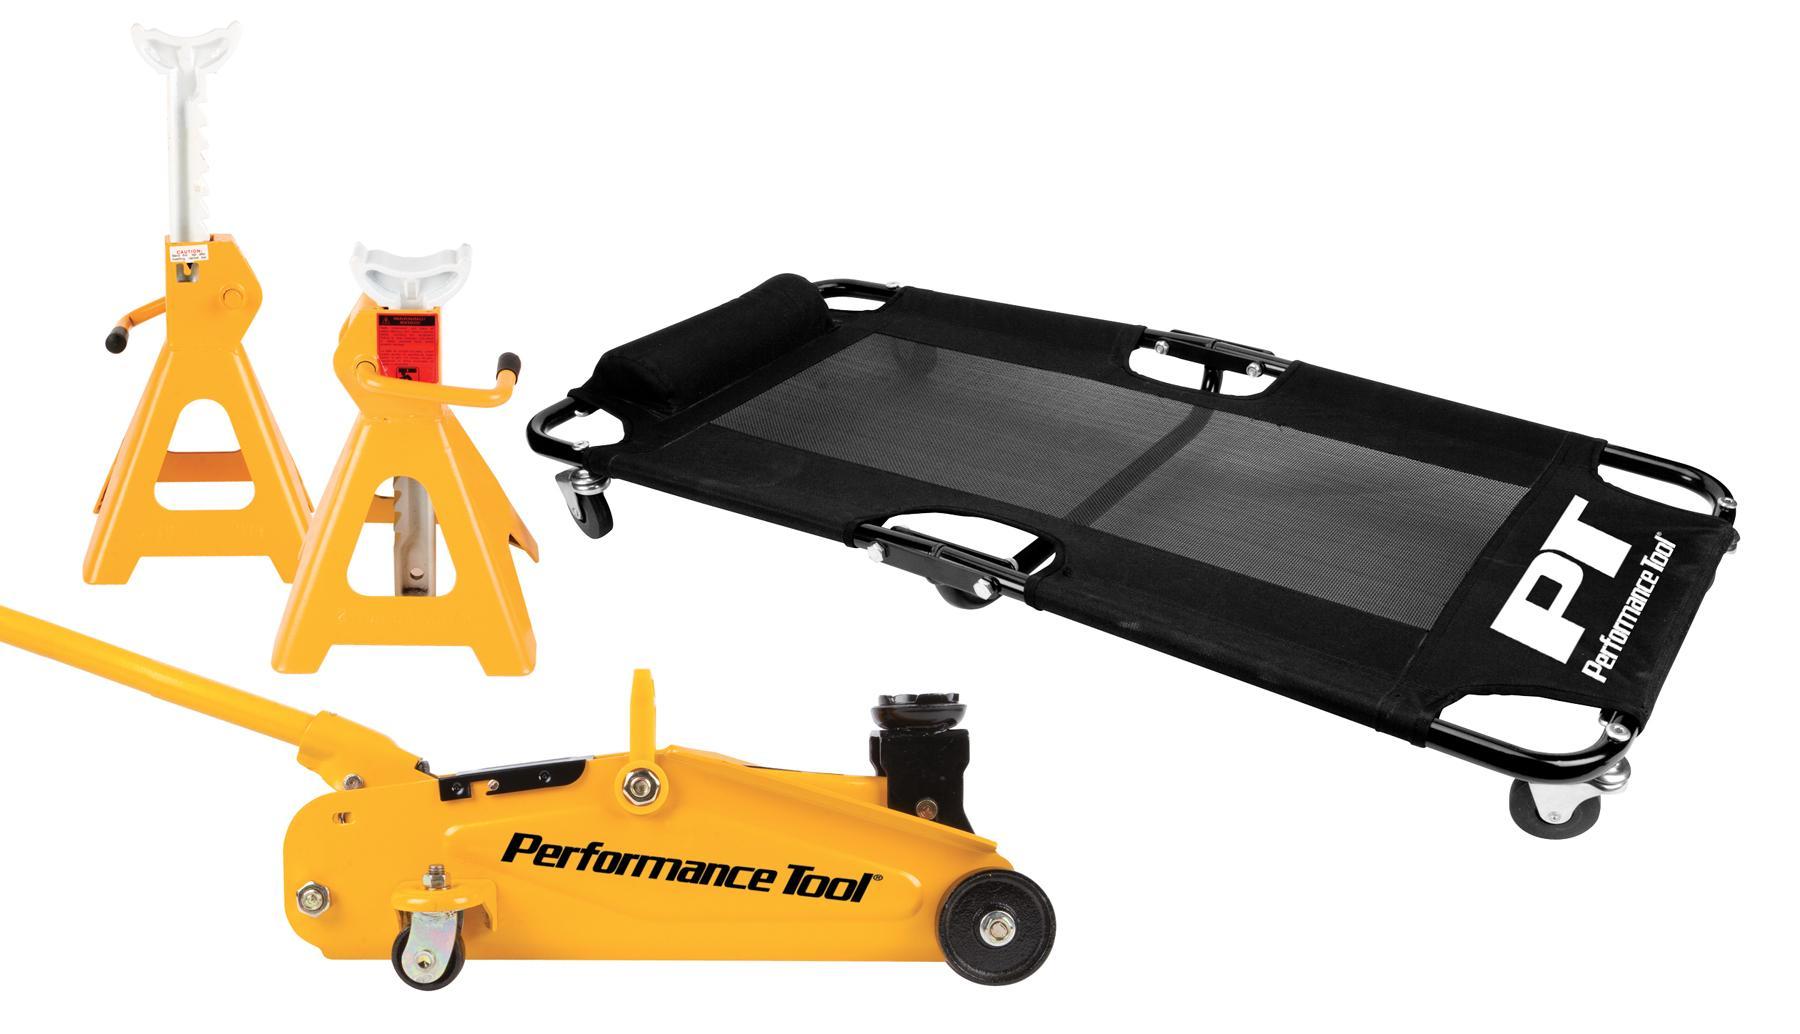 Performance Tool W1601 1 5 Ton Aluminum Floor Jack And